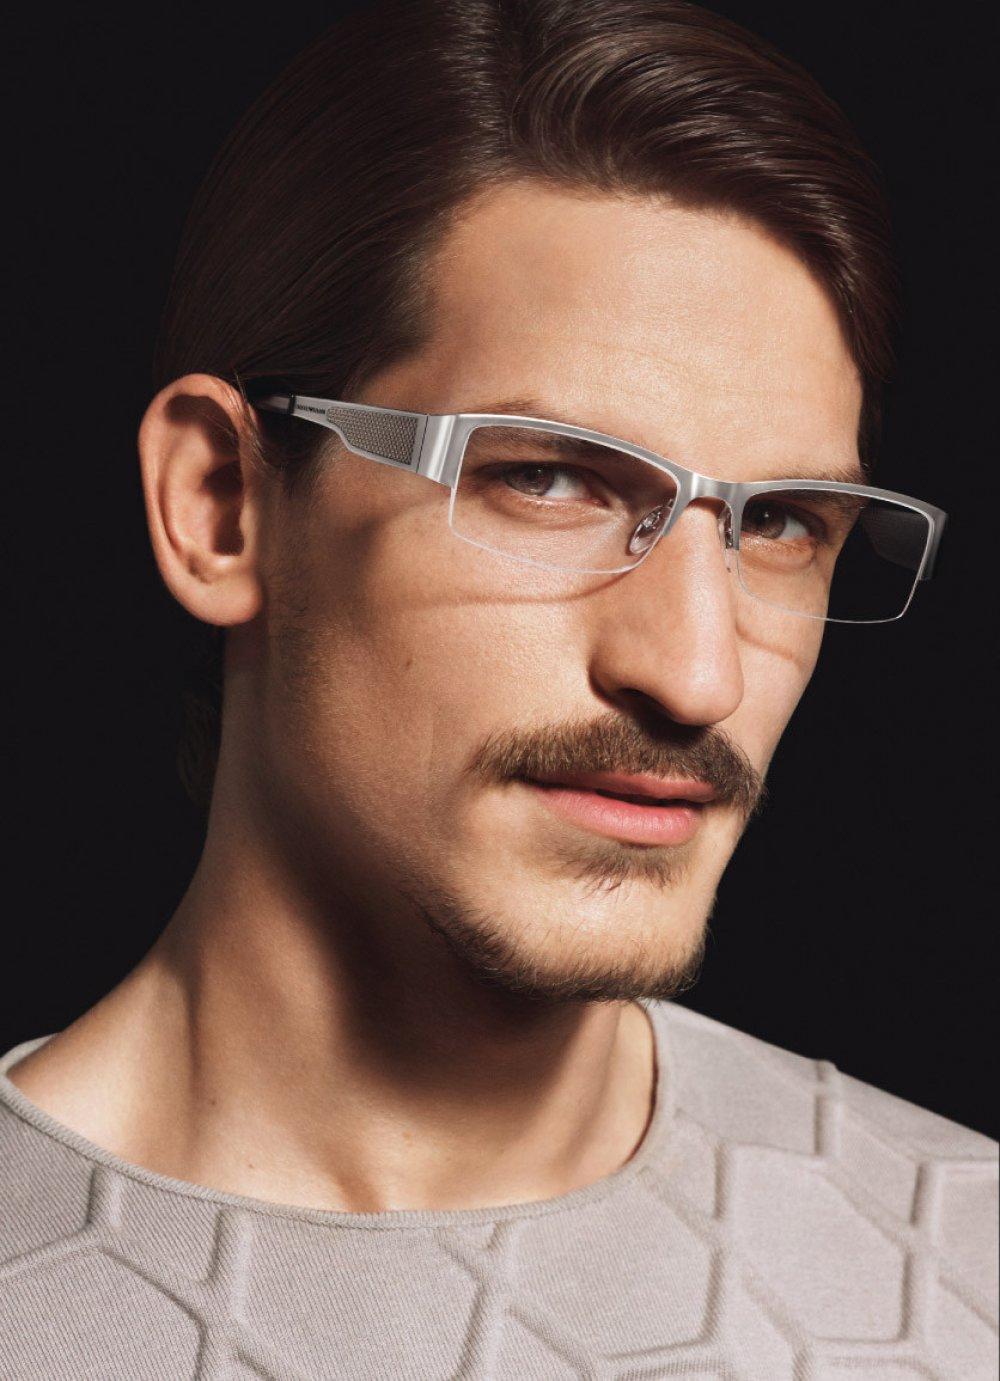 Armani Glasses Frames 2014 : Jarrod Scott for the Emporio Armani S/S 2014 Eyewear ...